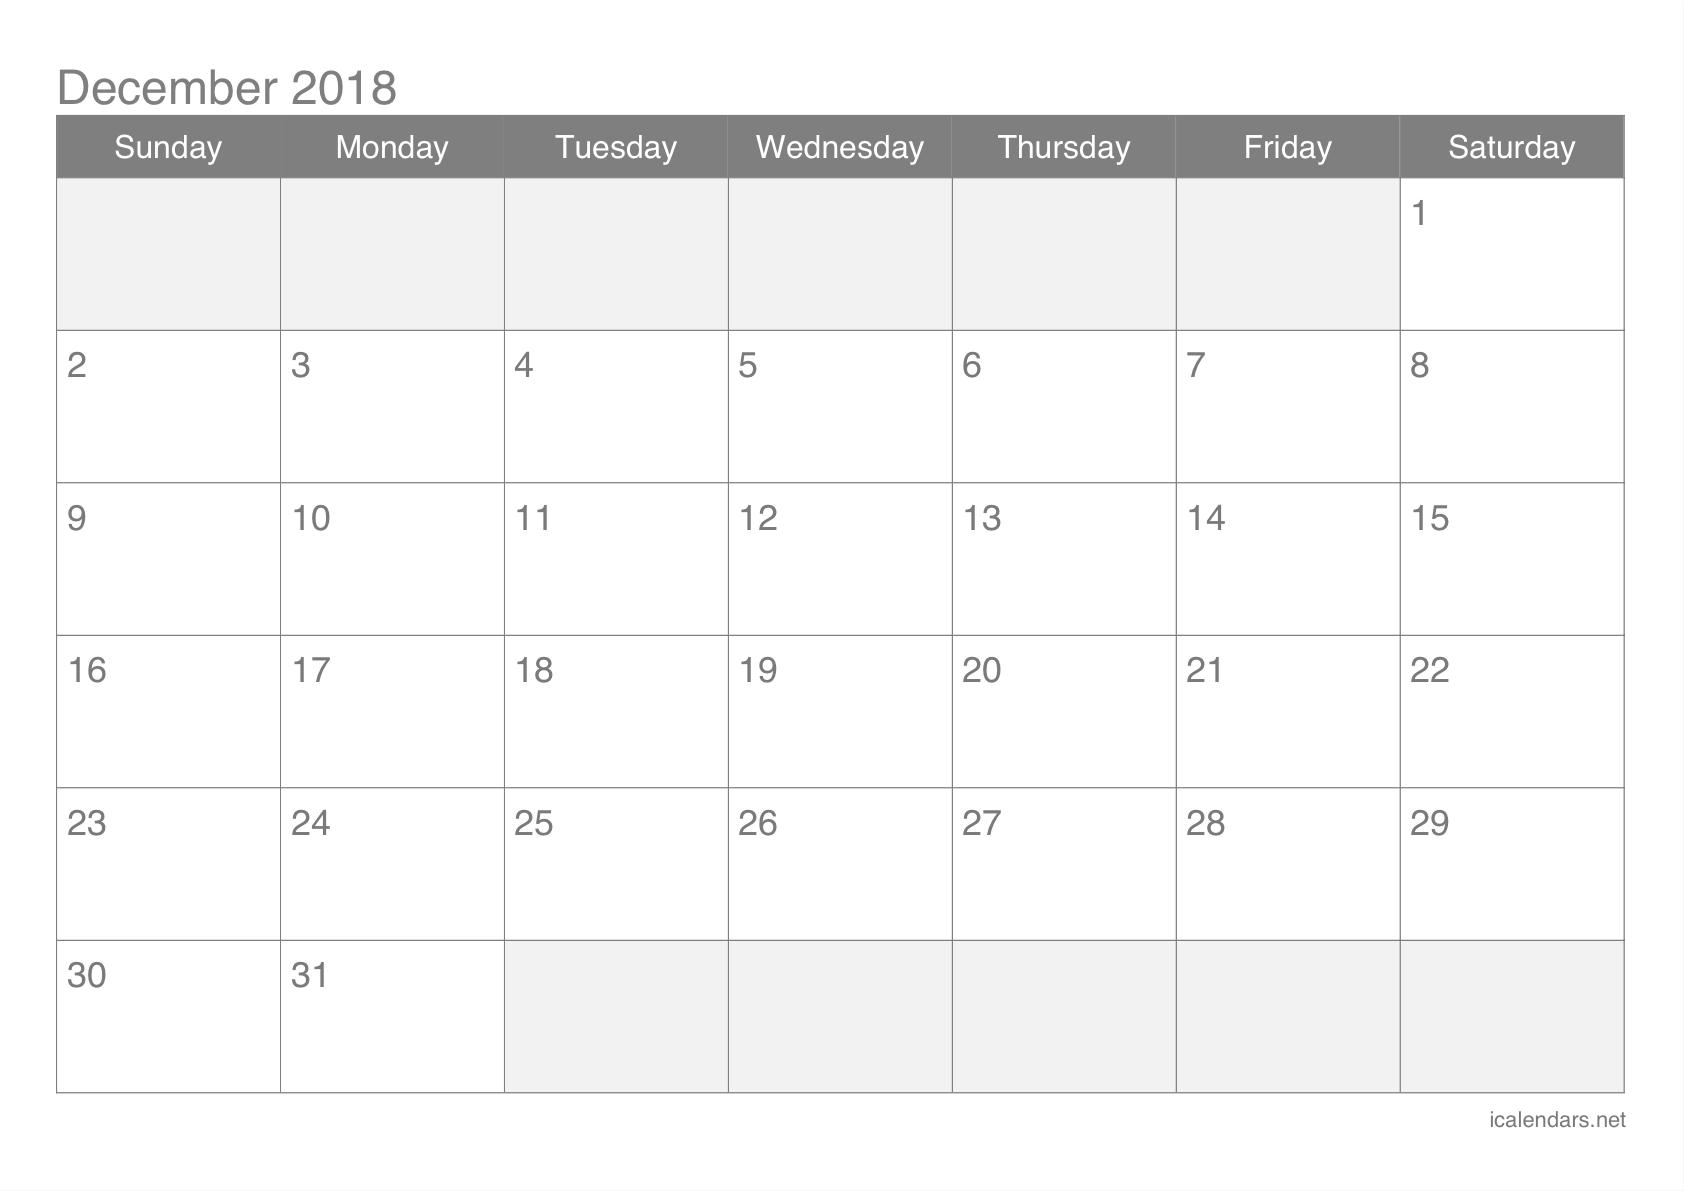 December Calendar 2018 Blank Pages